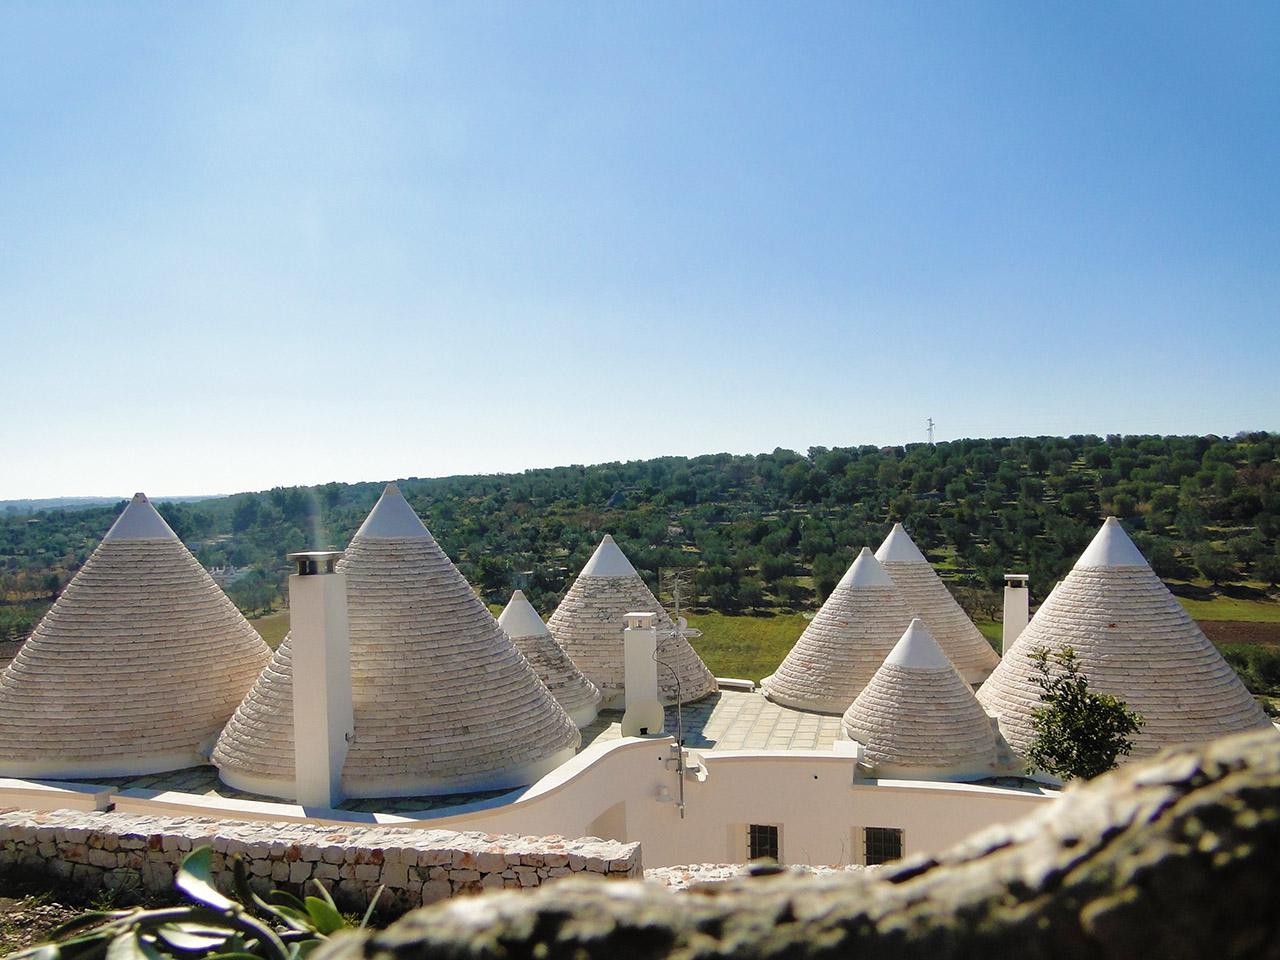 costruzioni restauri sirio ostuni residenza privata montesasso ostuni dsc00079